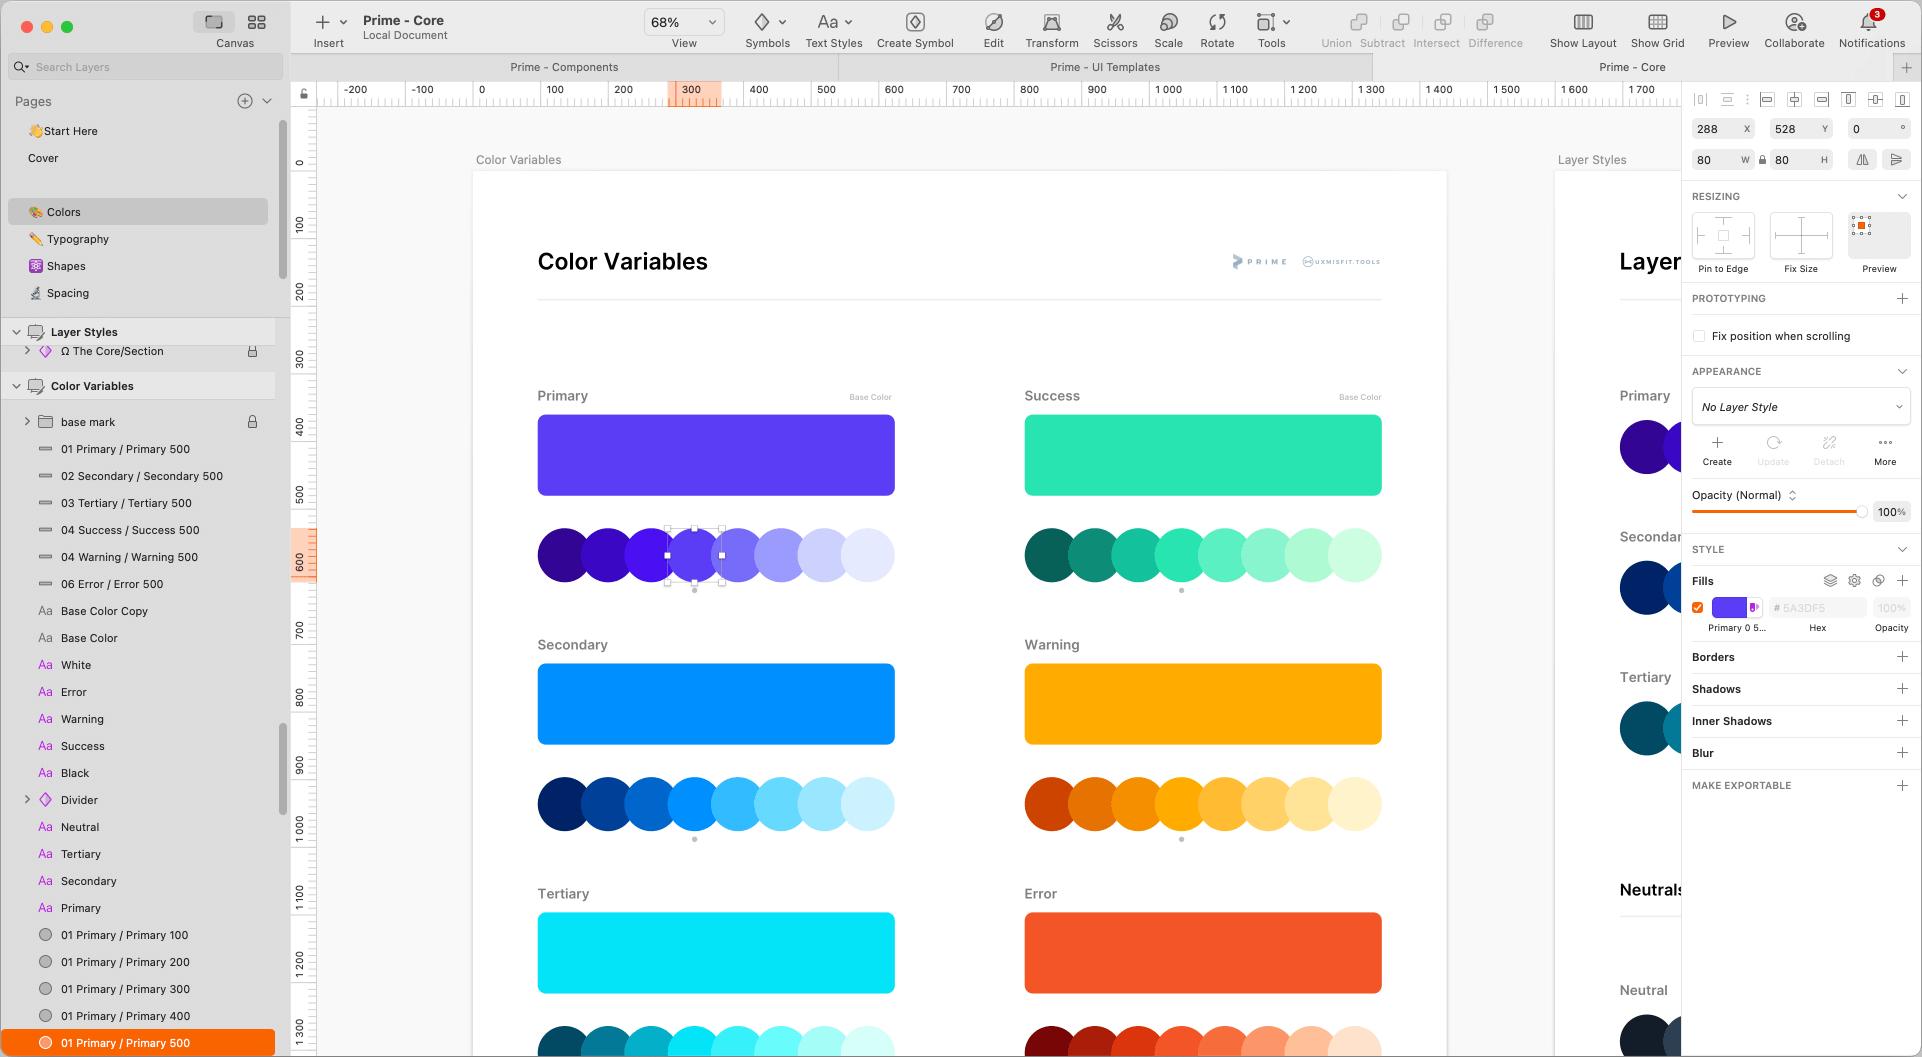 Prime 3 - colors